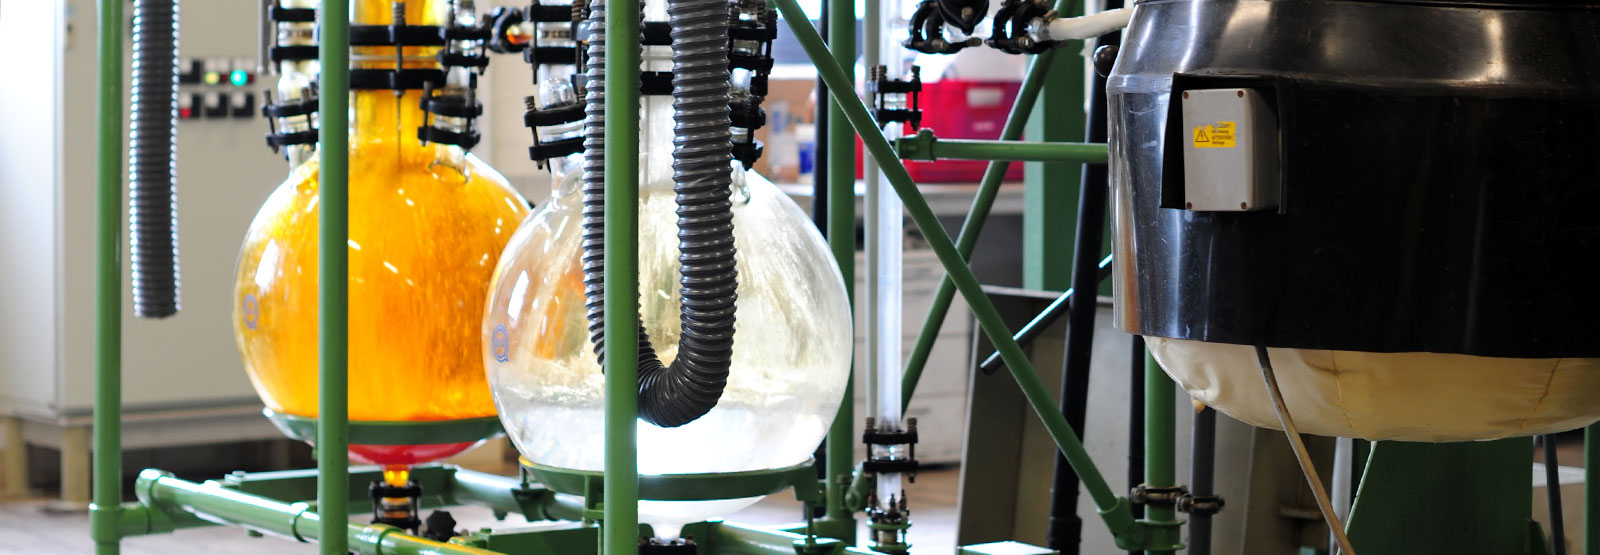 Rundkolben während des Prozesses des Edelmetall-Recyclings